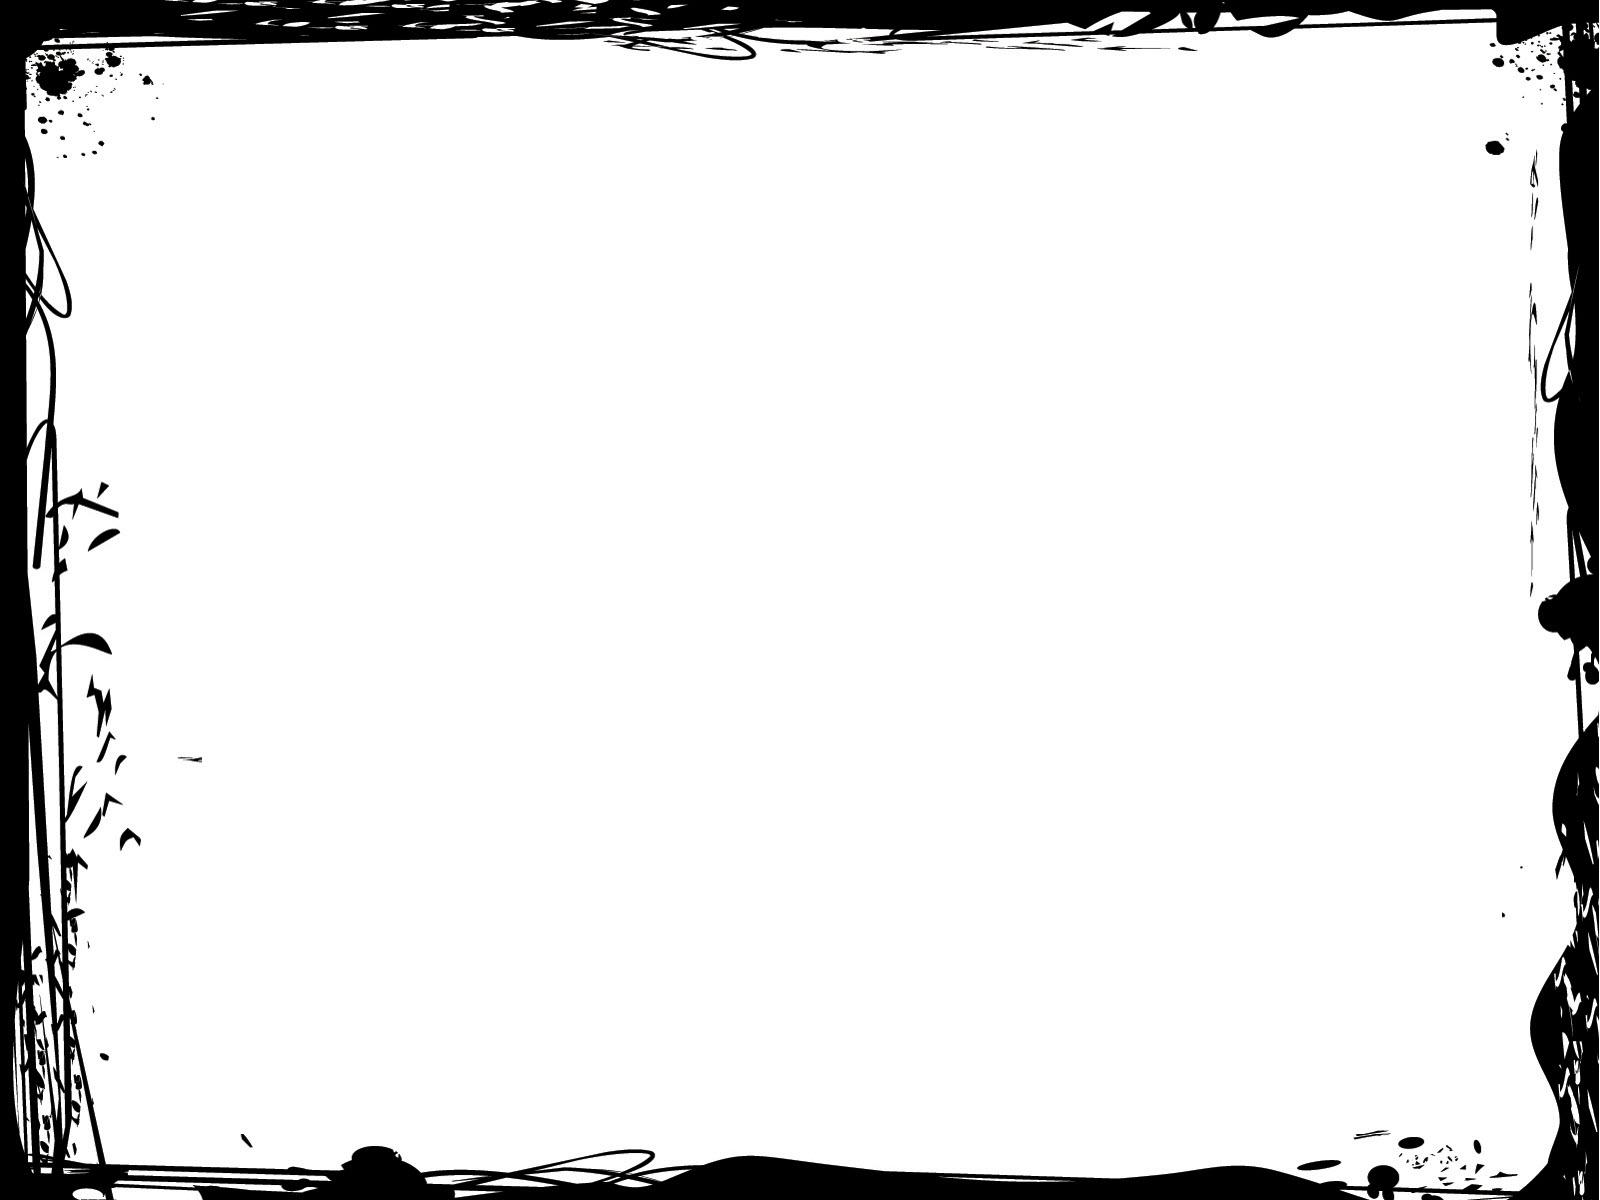 Background powerpoint màu trắng đẹp